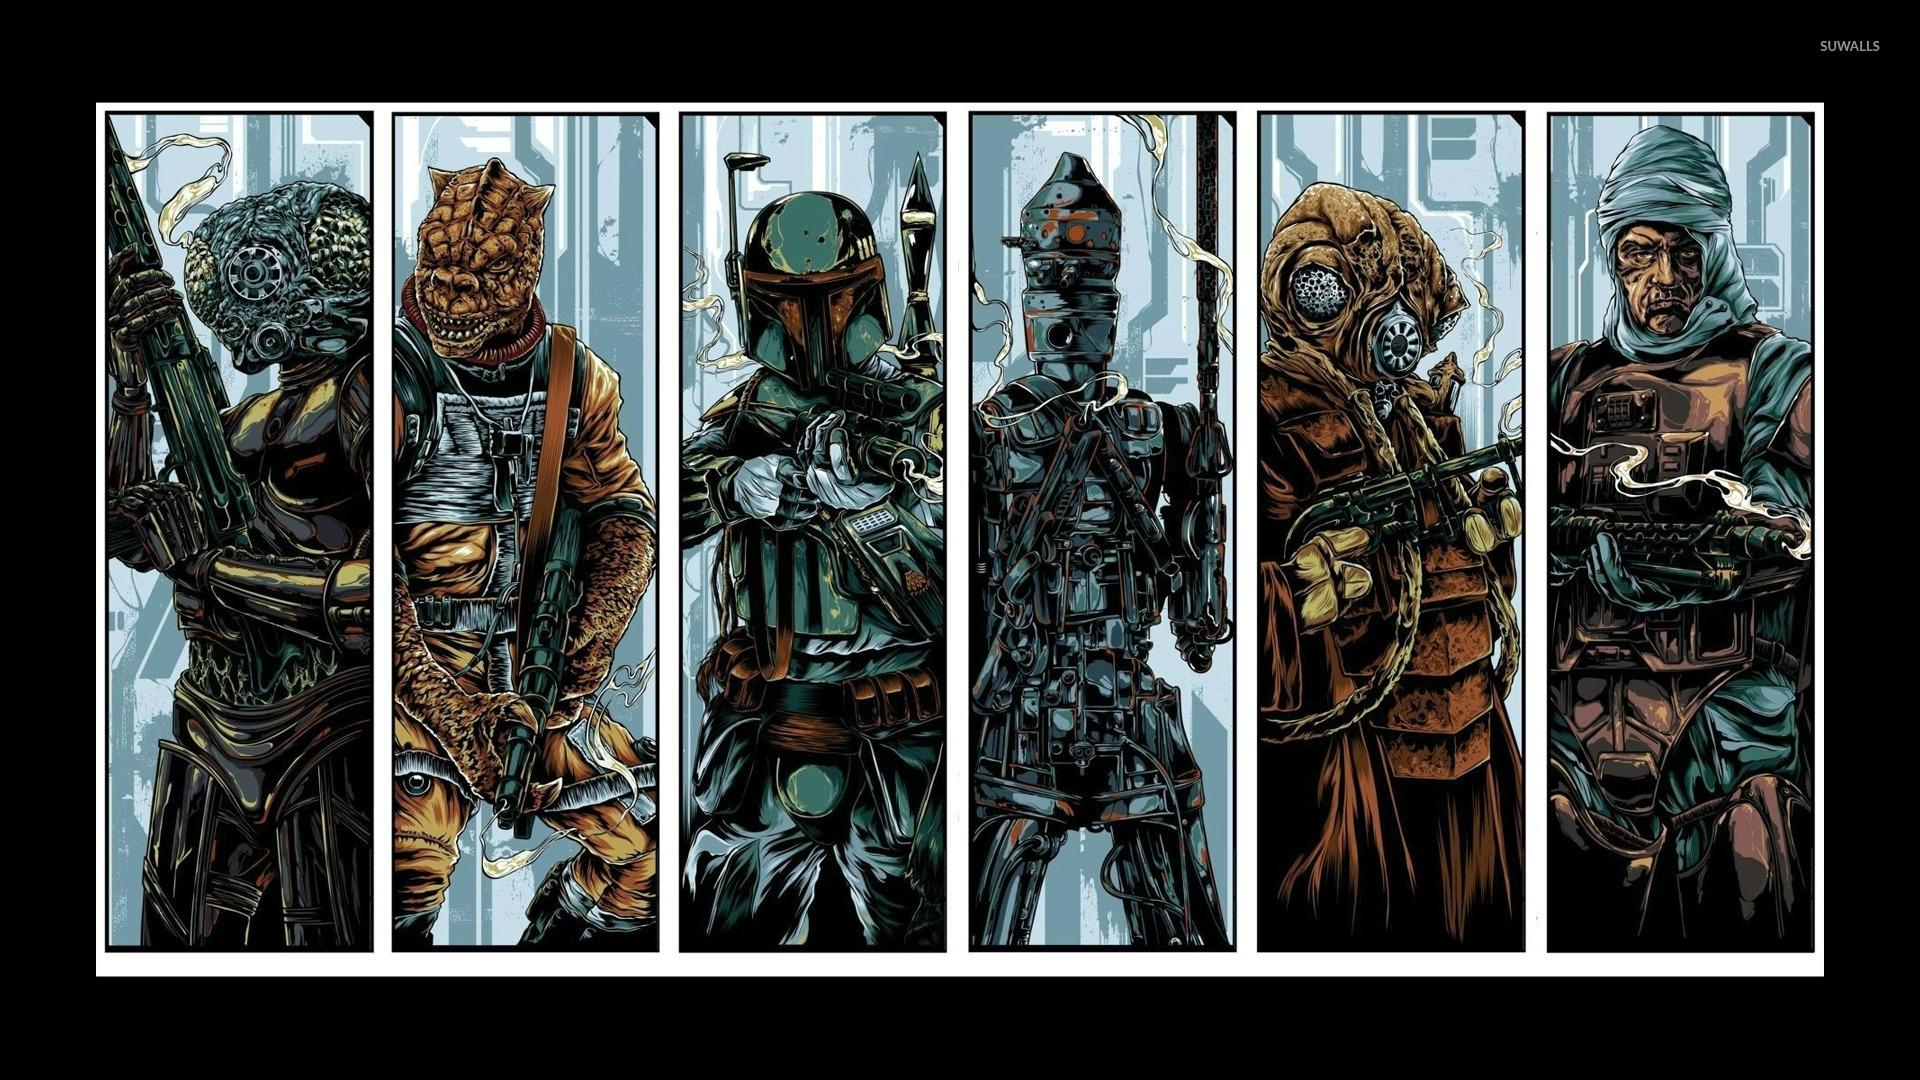 star wars: bounty hunter wallpaper - game wallpapers - #15901